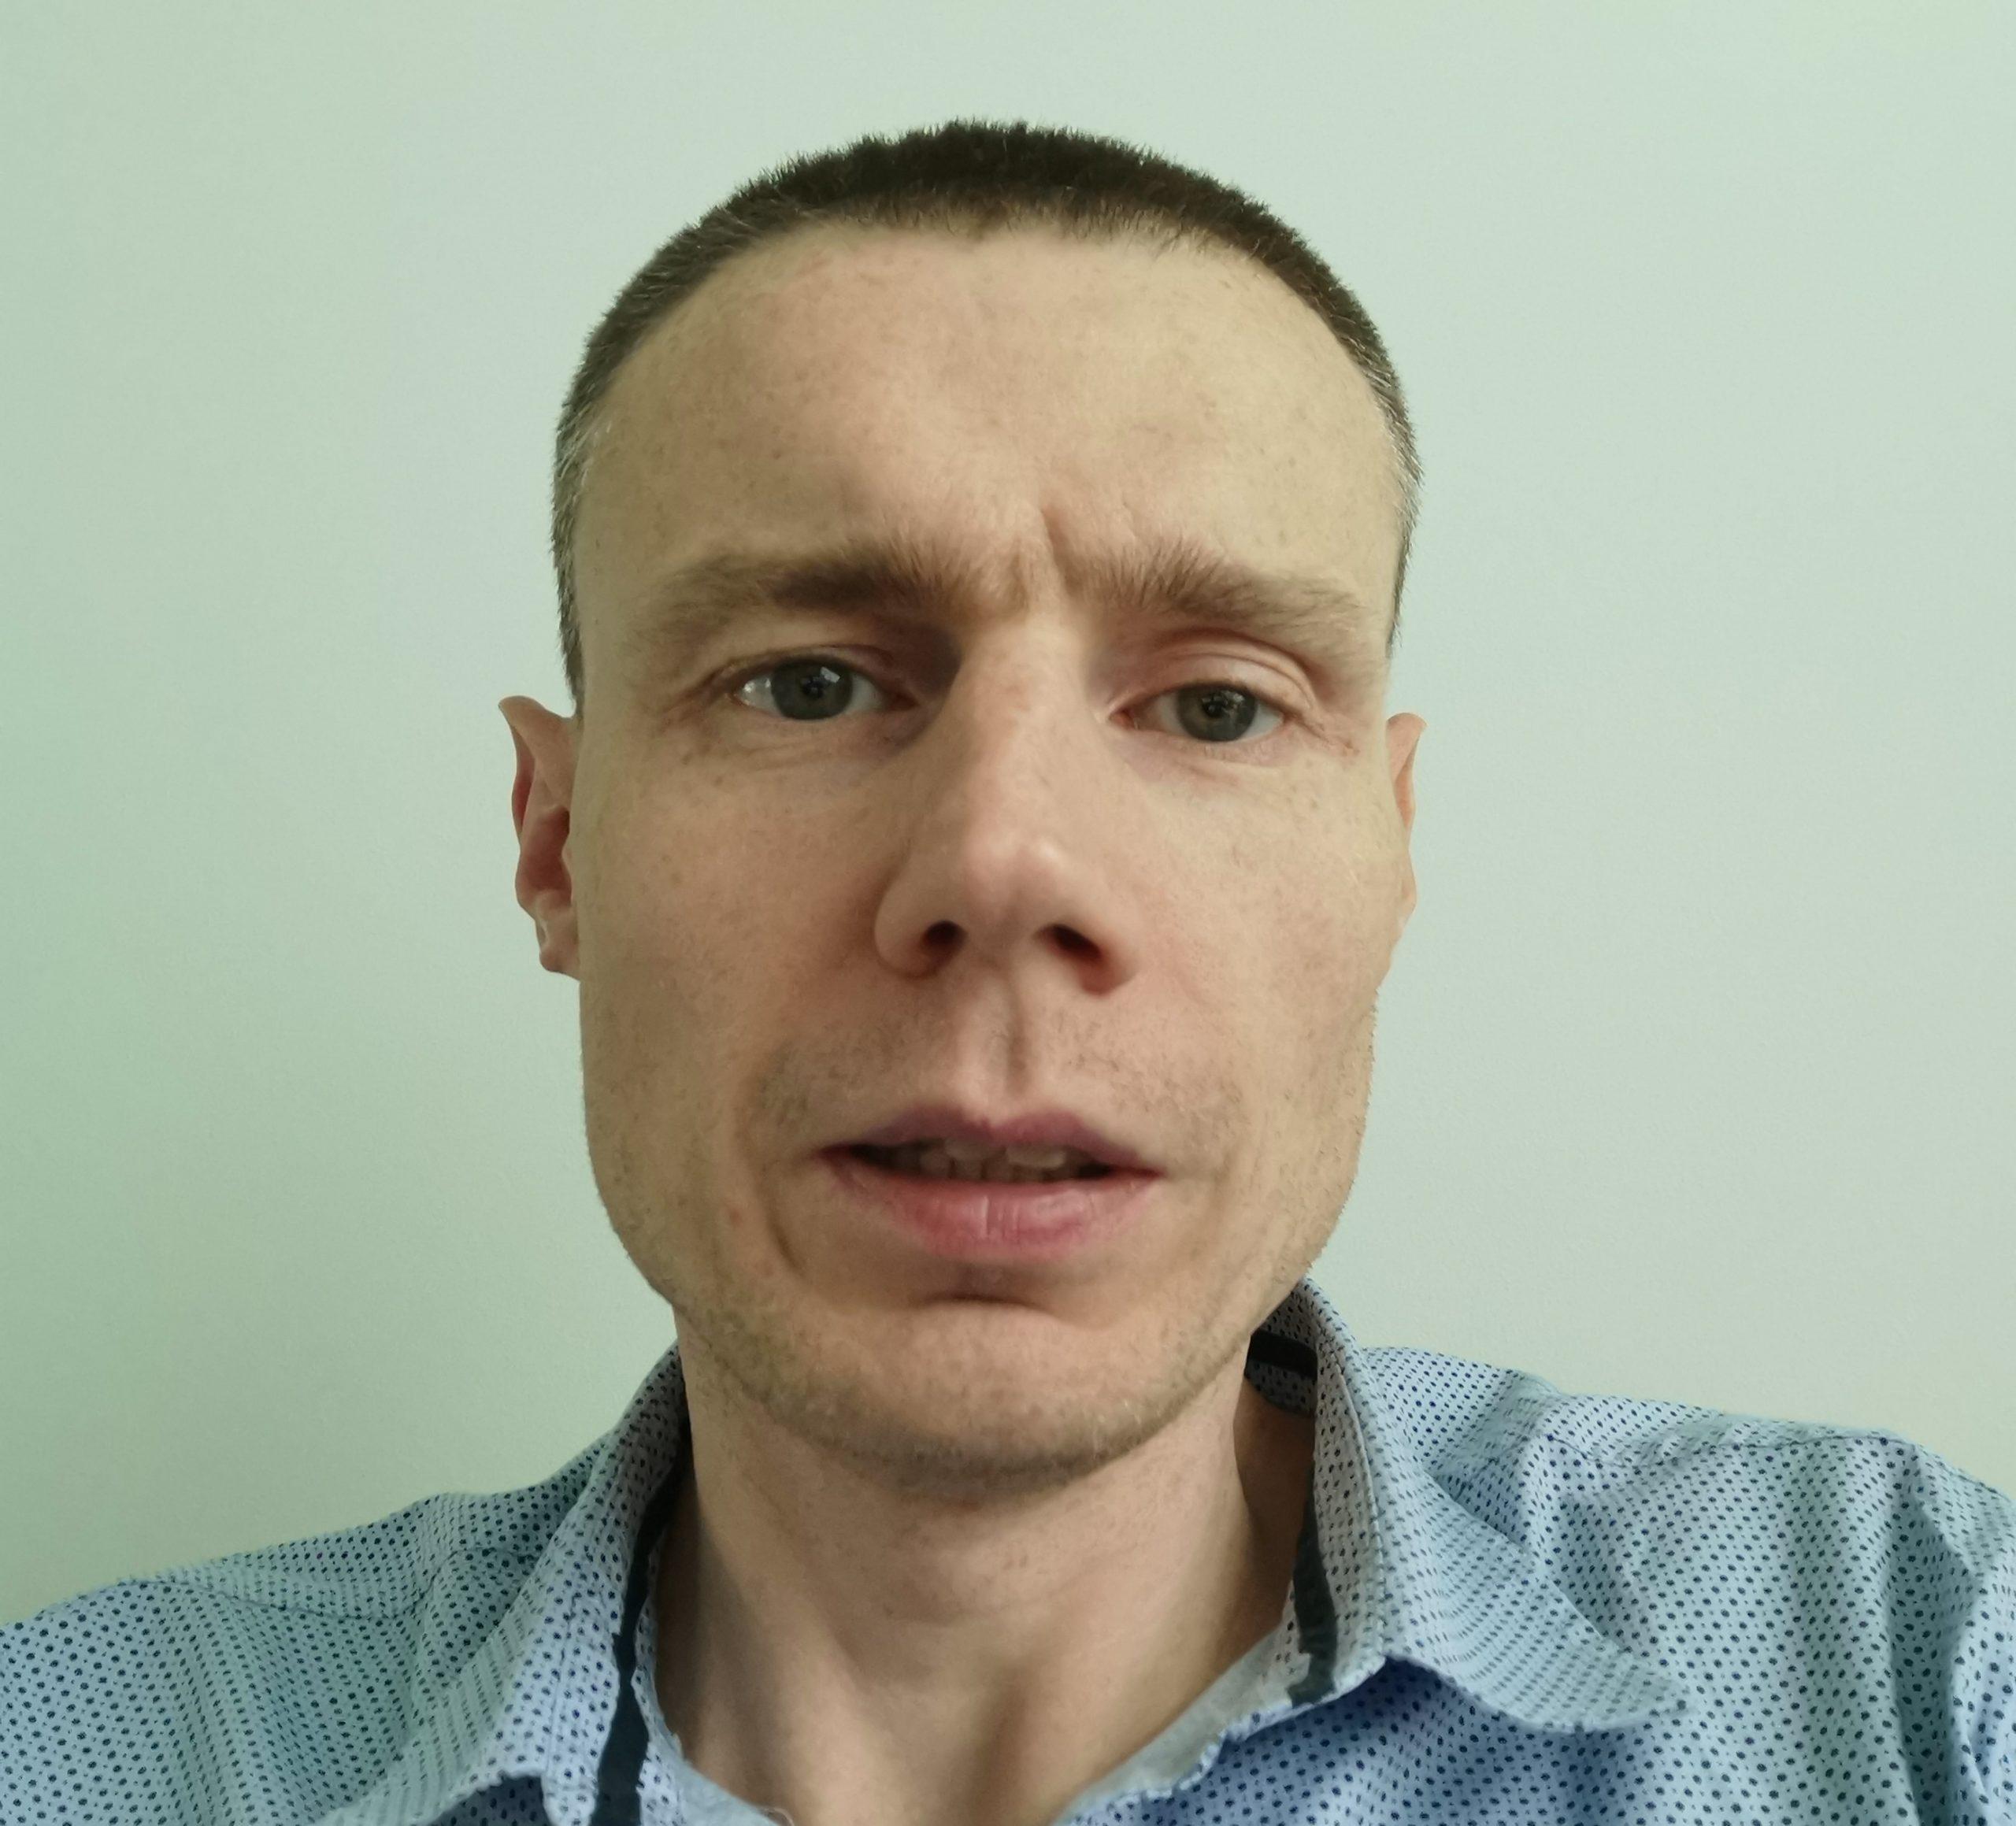 Marek_Majchrzyk_AGH